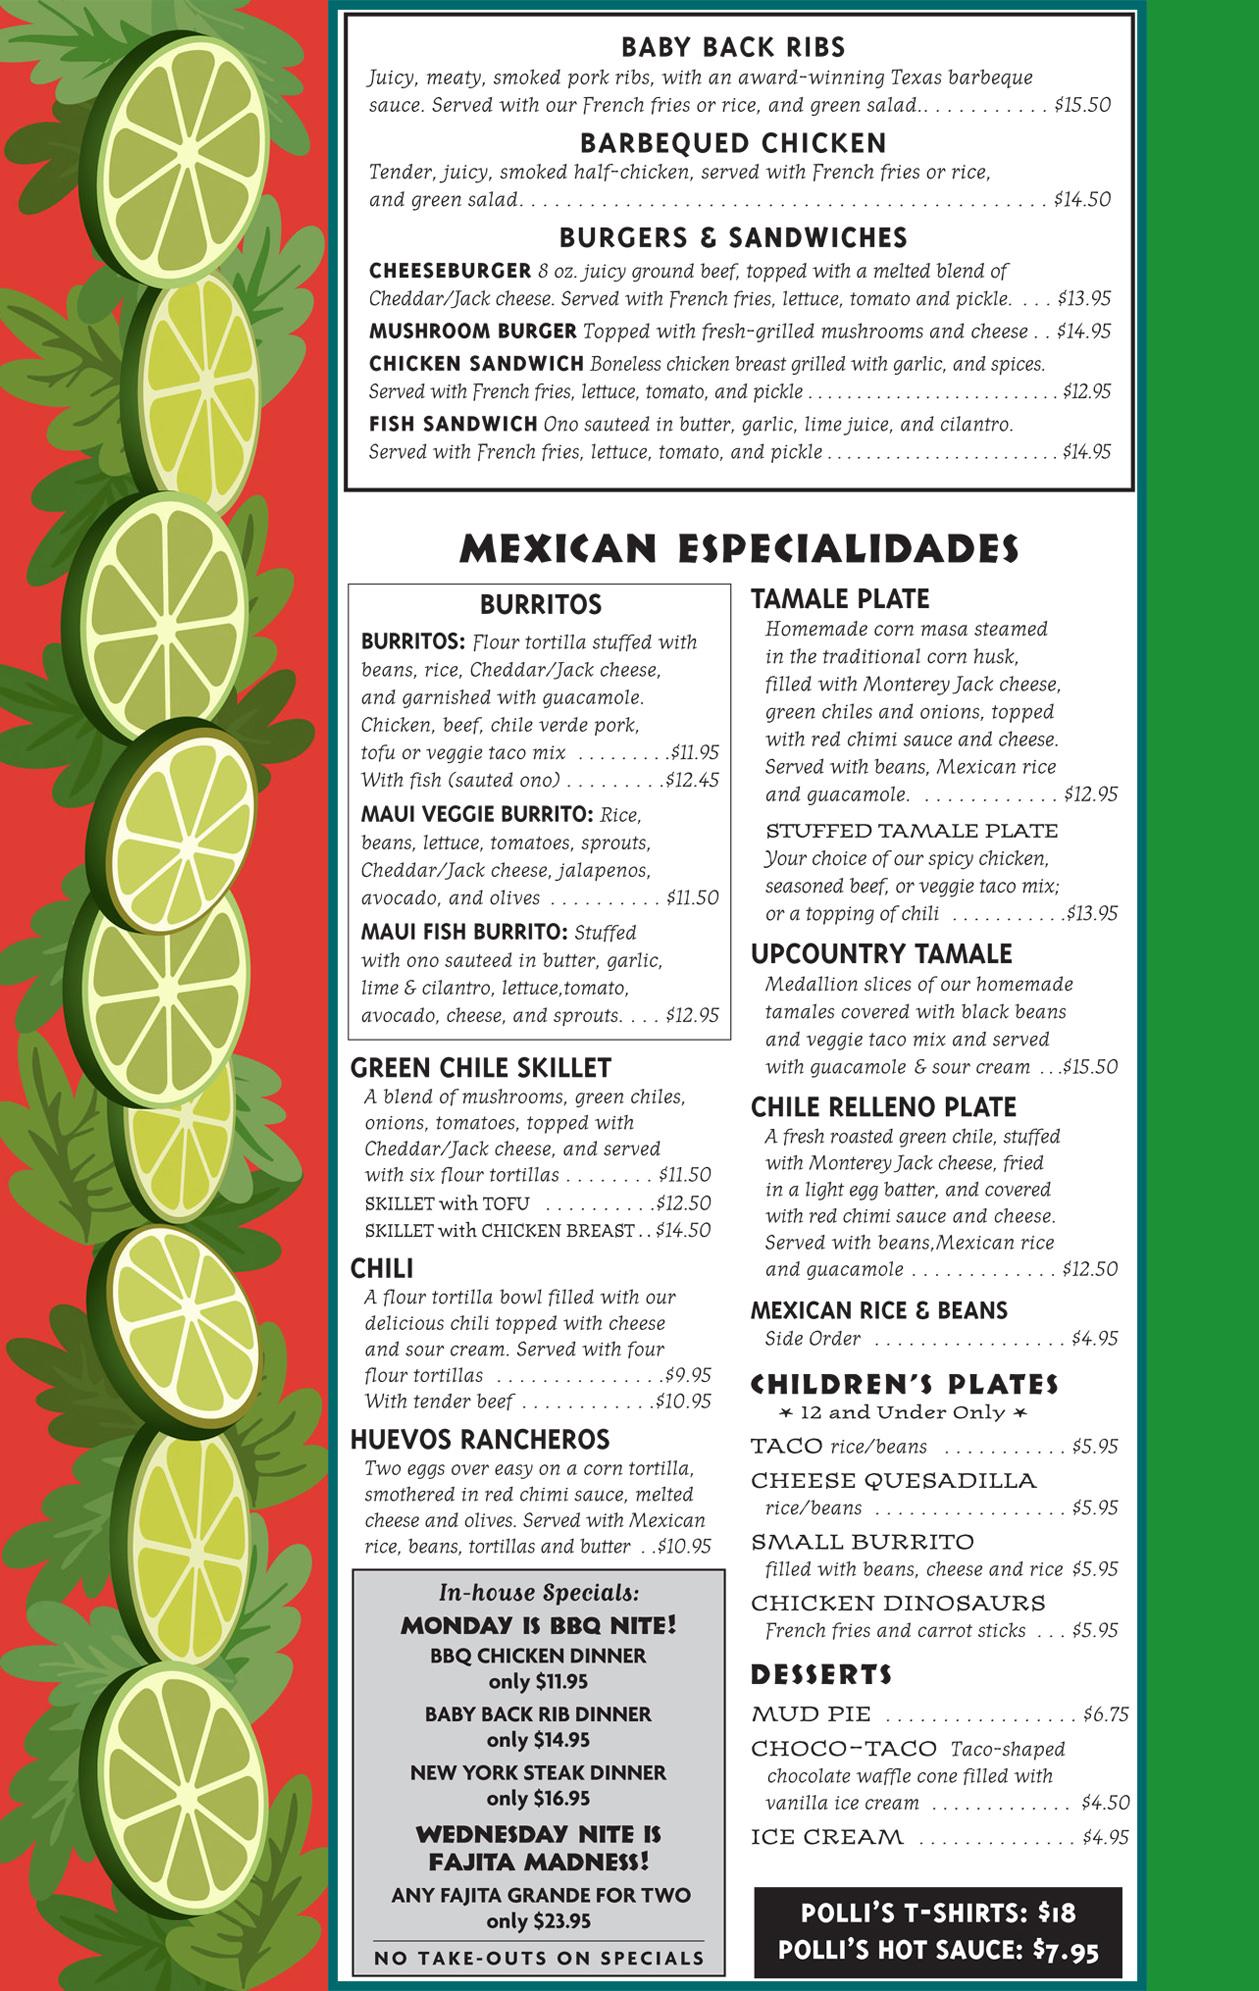 Pollis Mexican Restaurant Lunch Menu Page 3.jpg